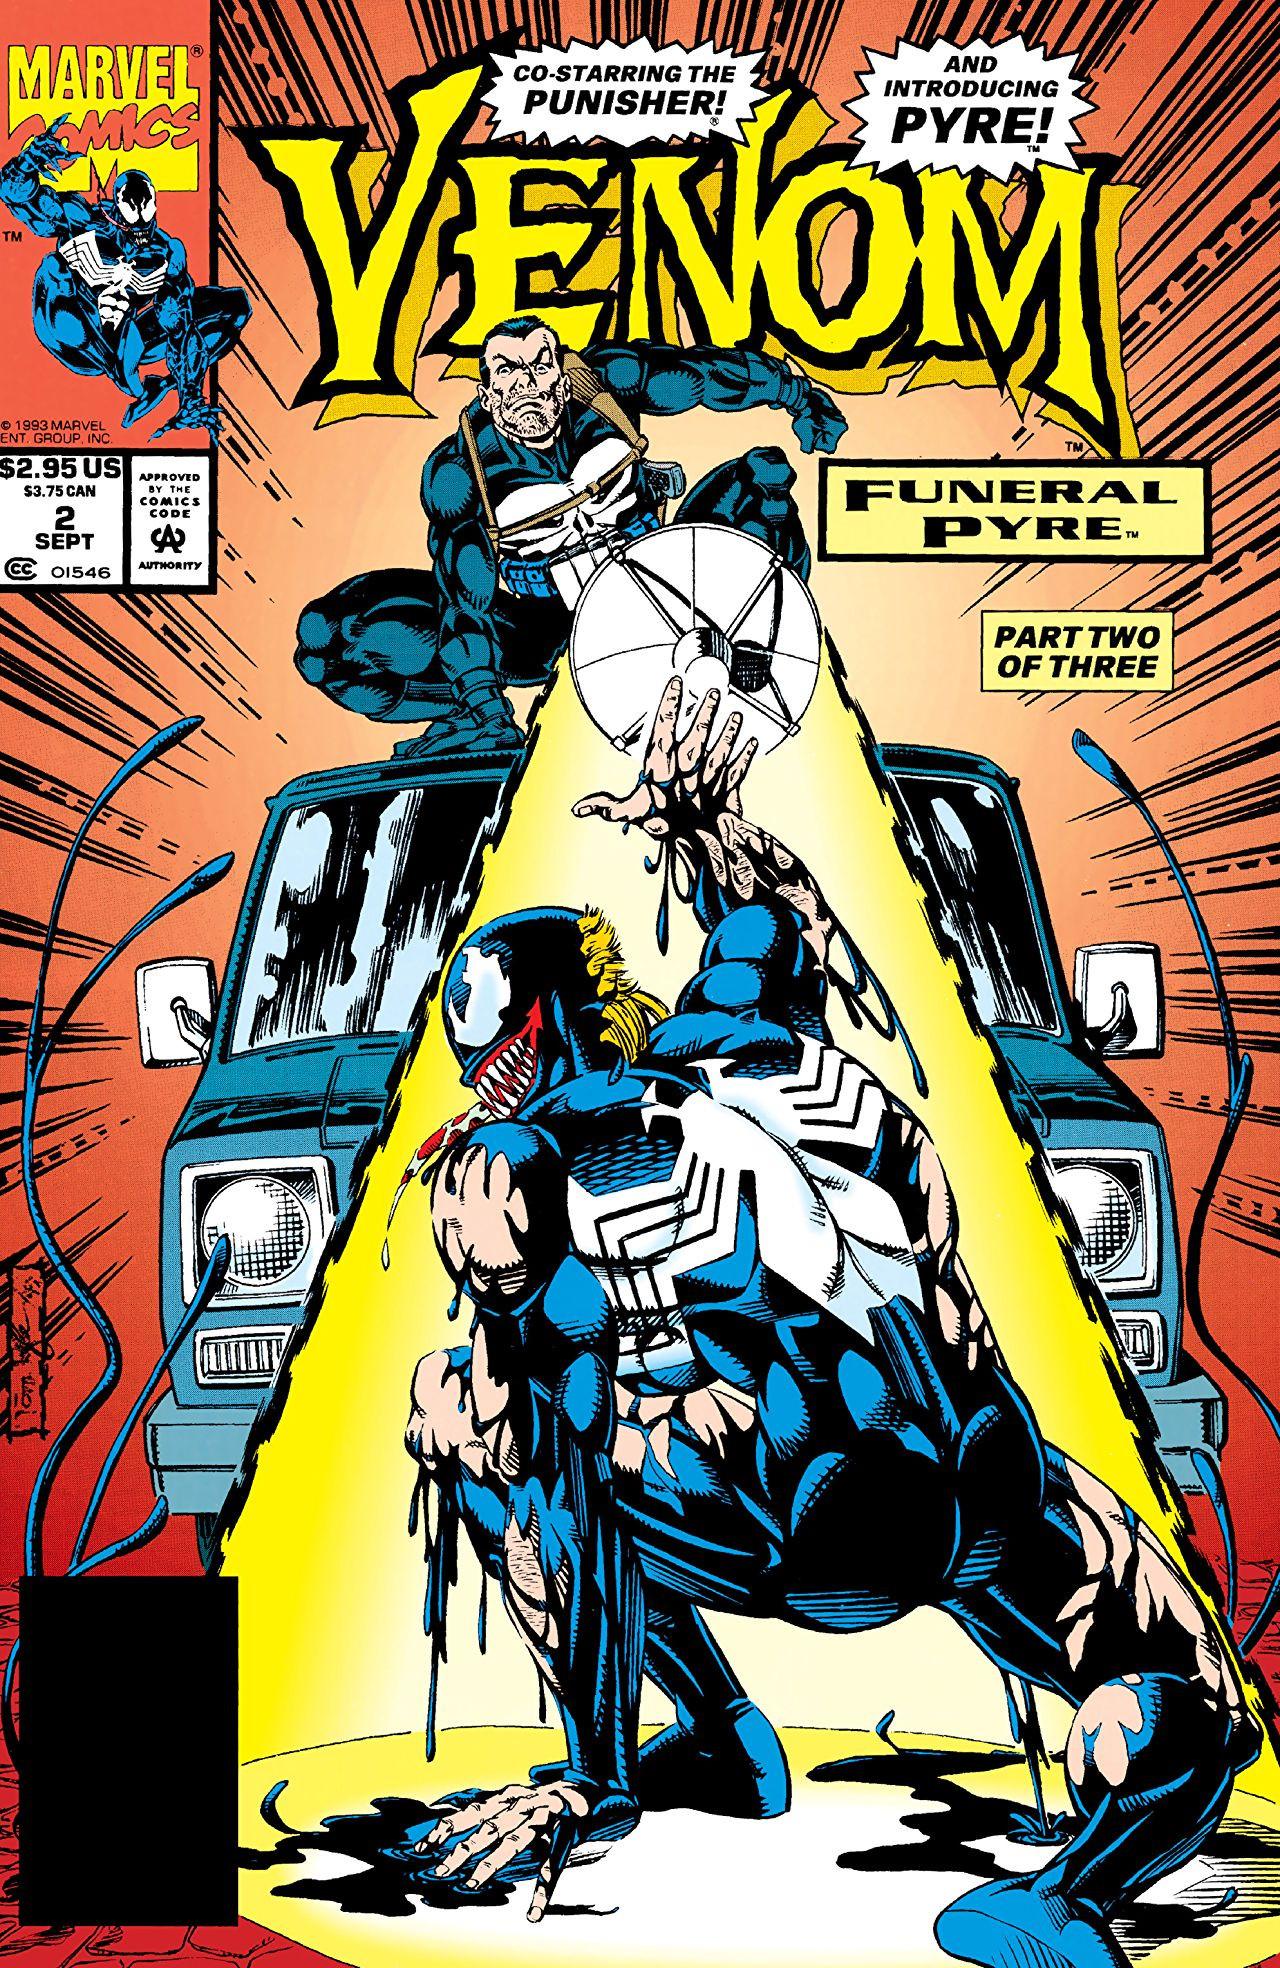 Venom: Funeral Pyre Vol 1 2